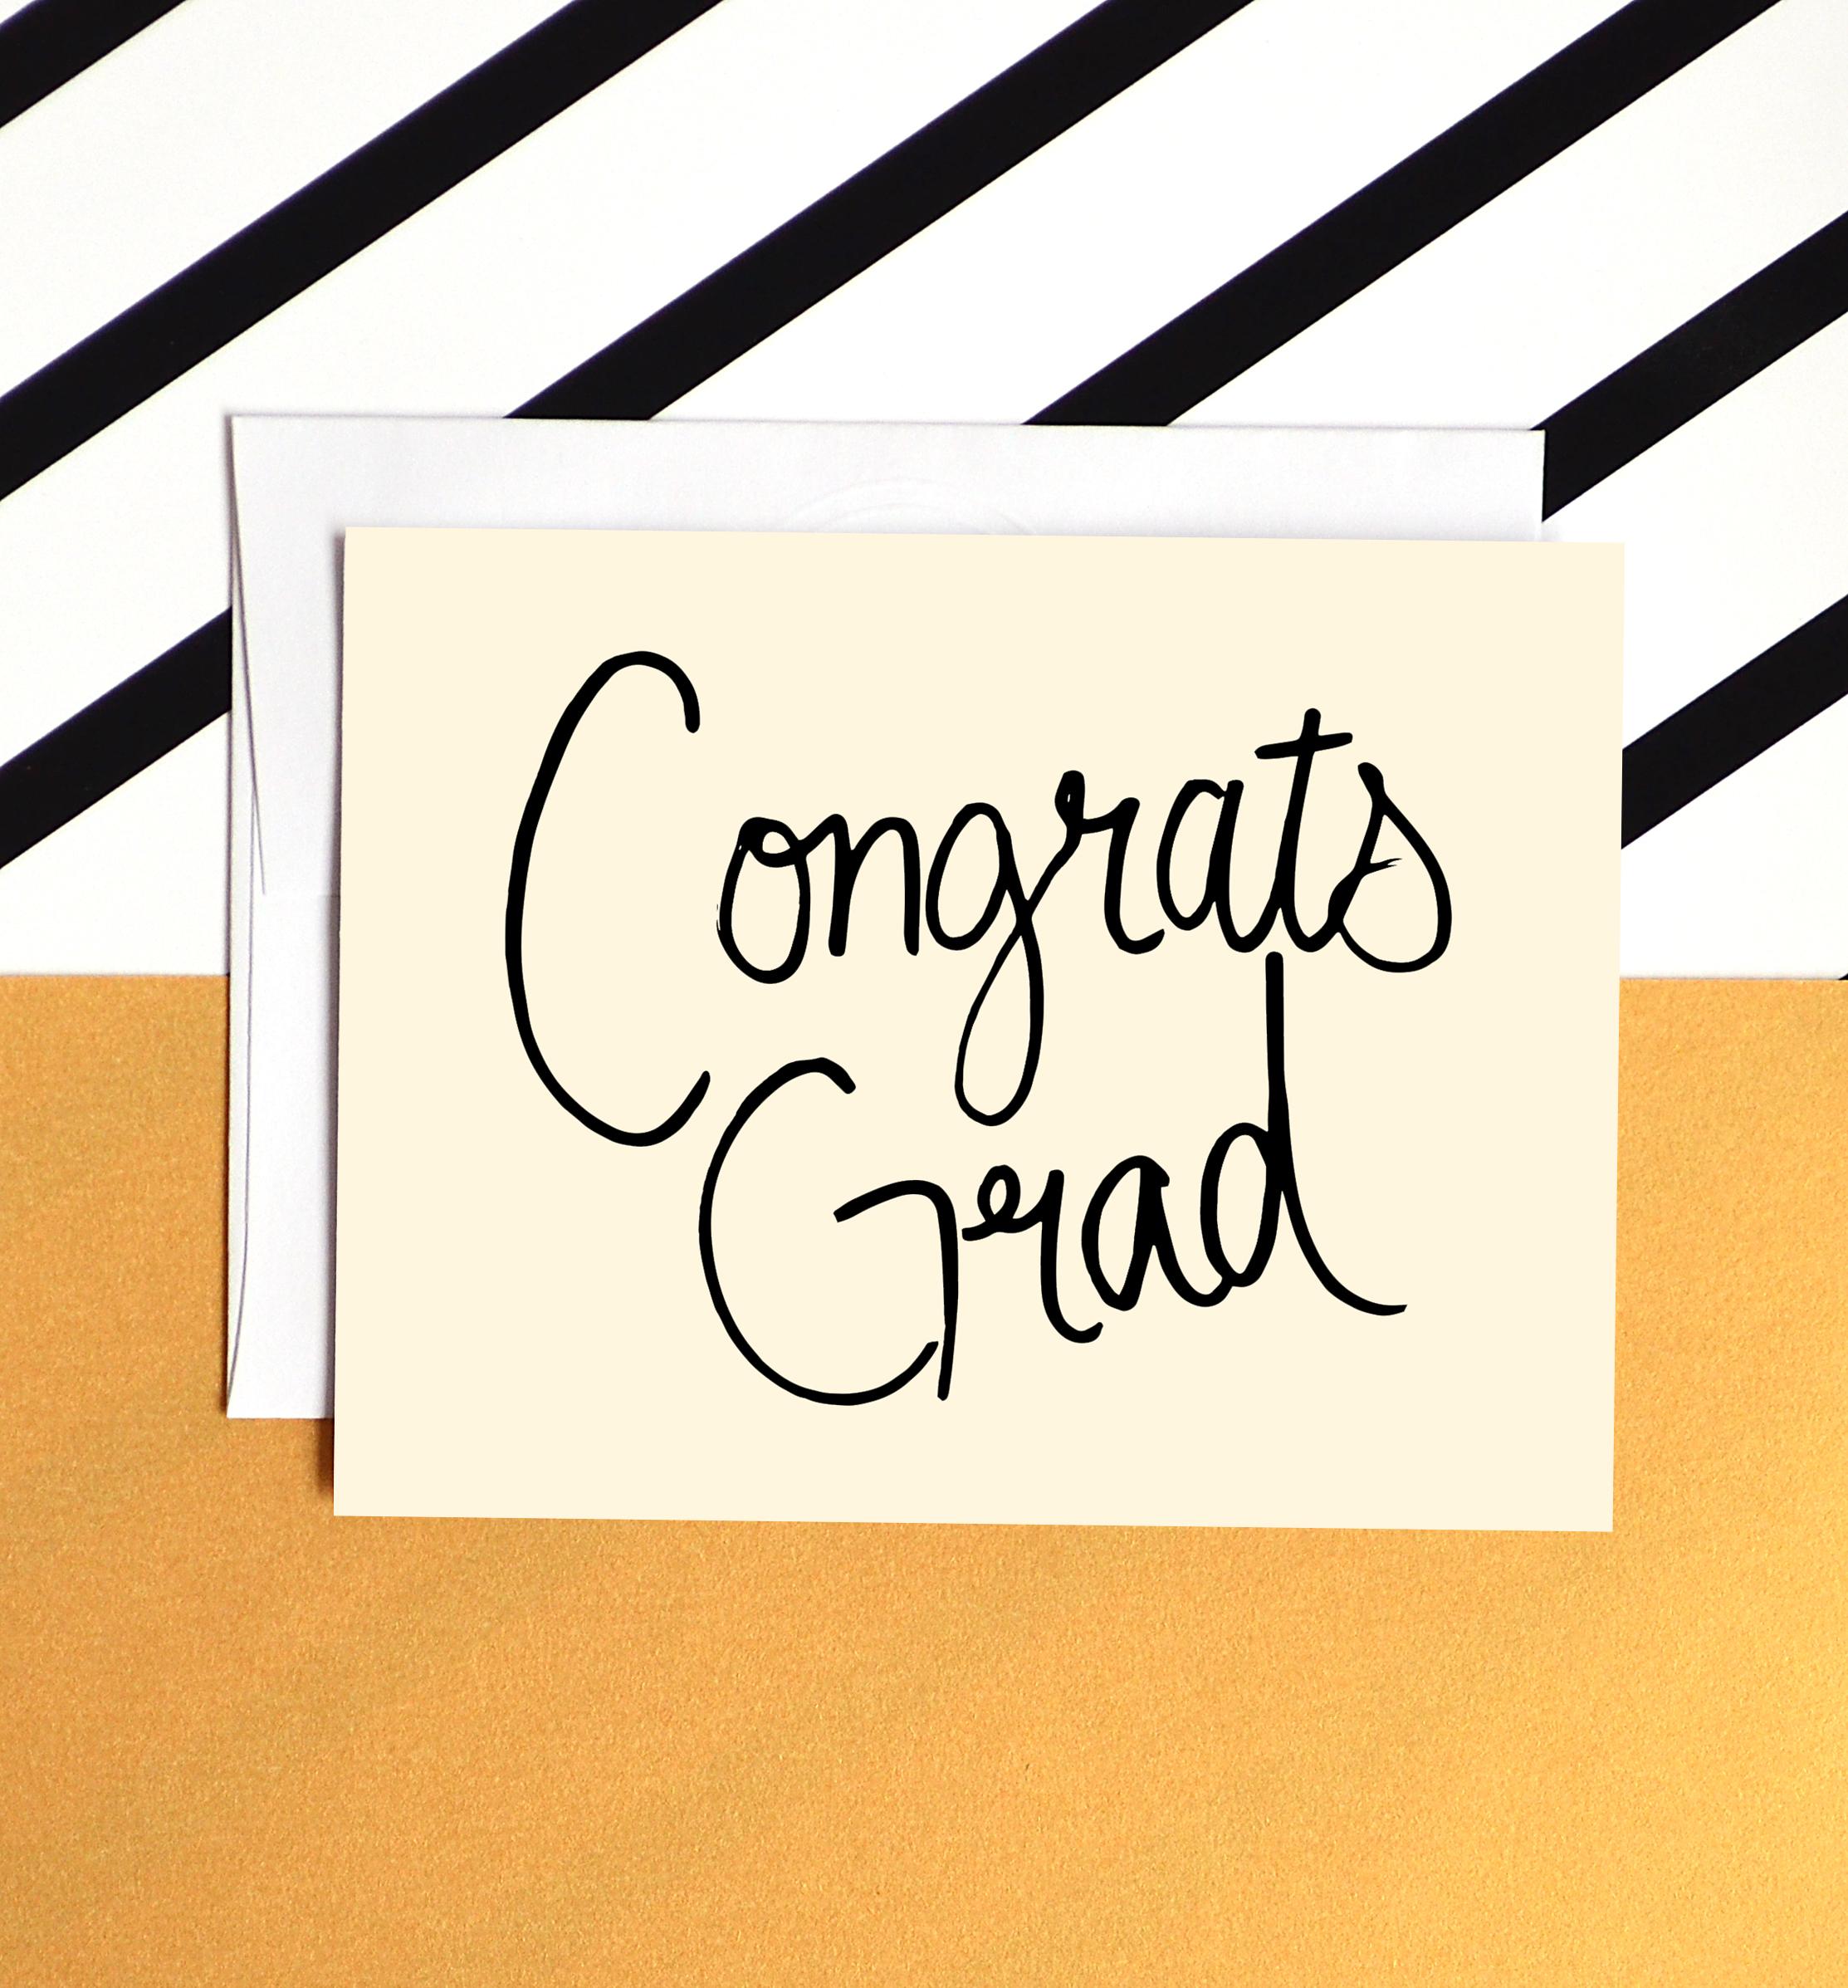 congrats grad card black and cream hand lettered graduation card